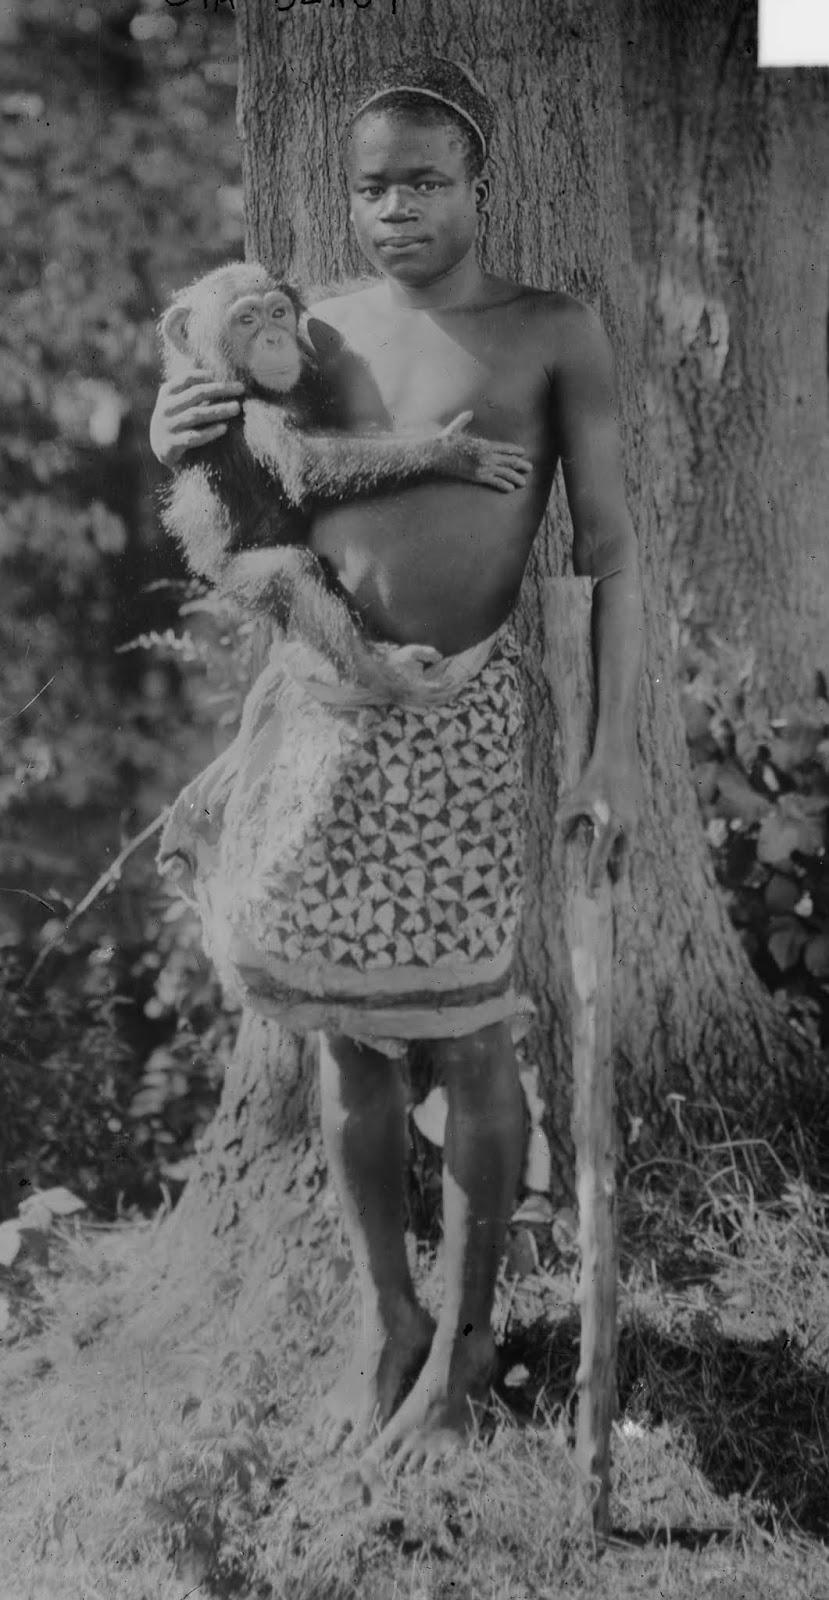 Ota Benga, a Congolese man, in New York's Bronx Zoo in 1906.